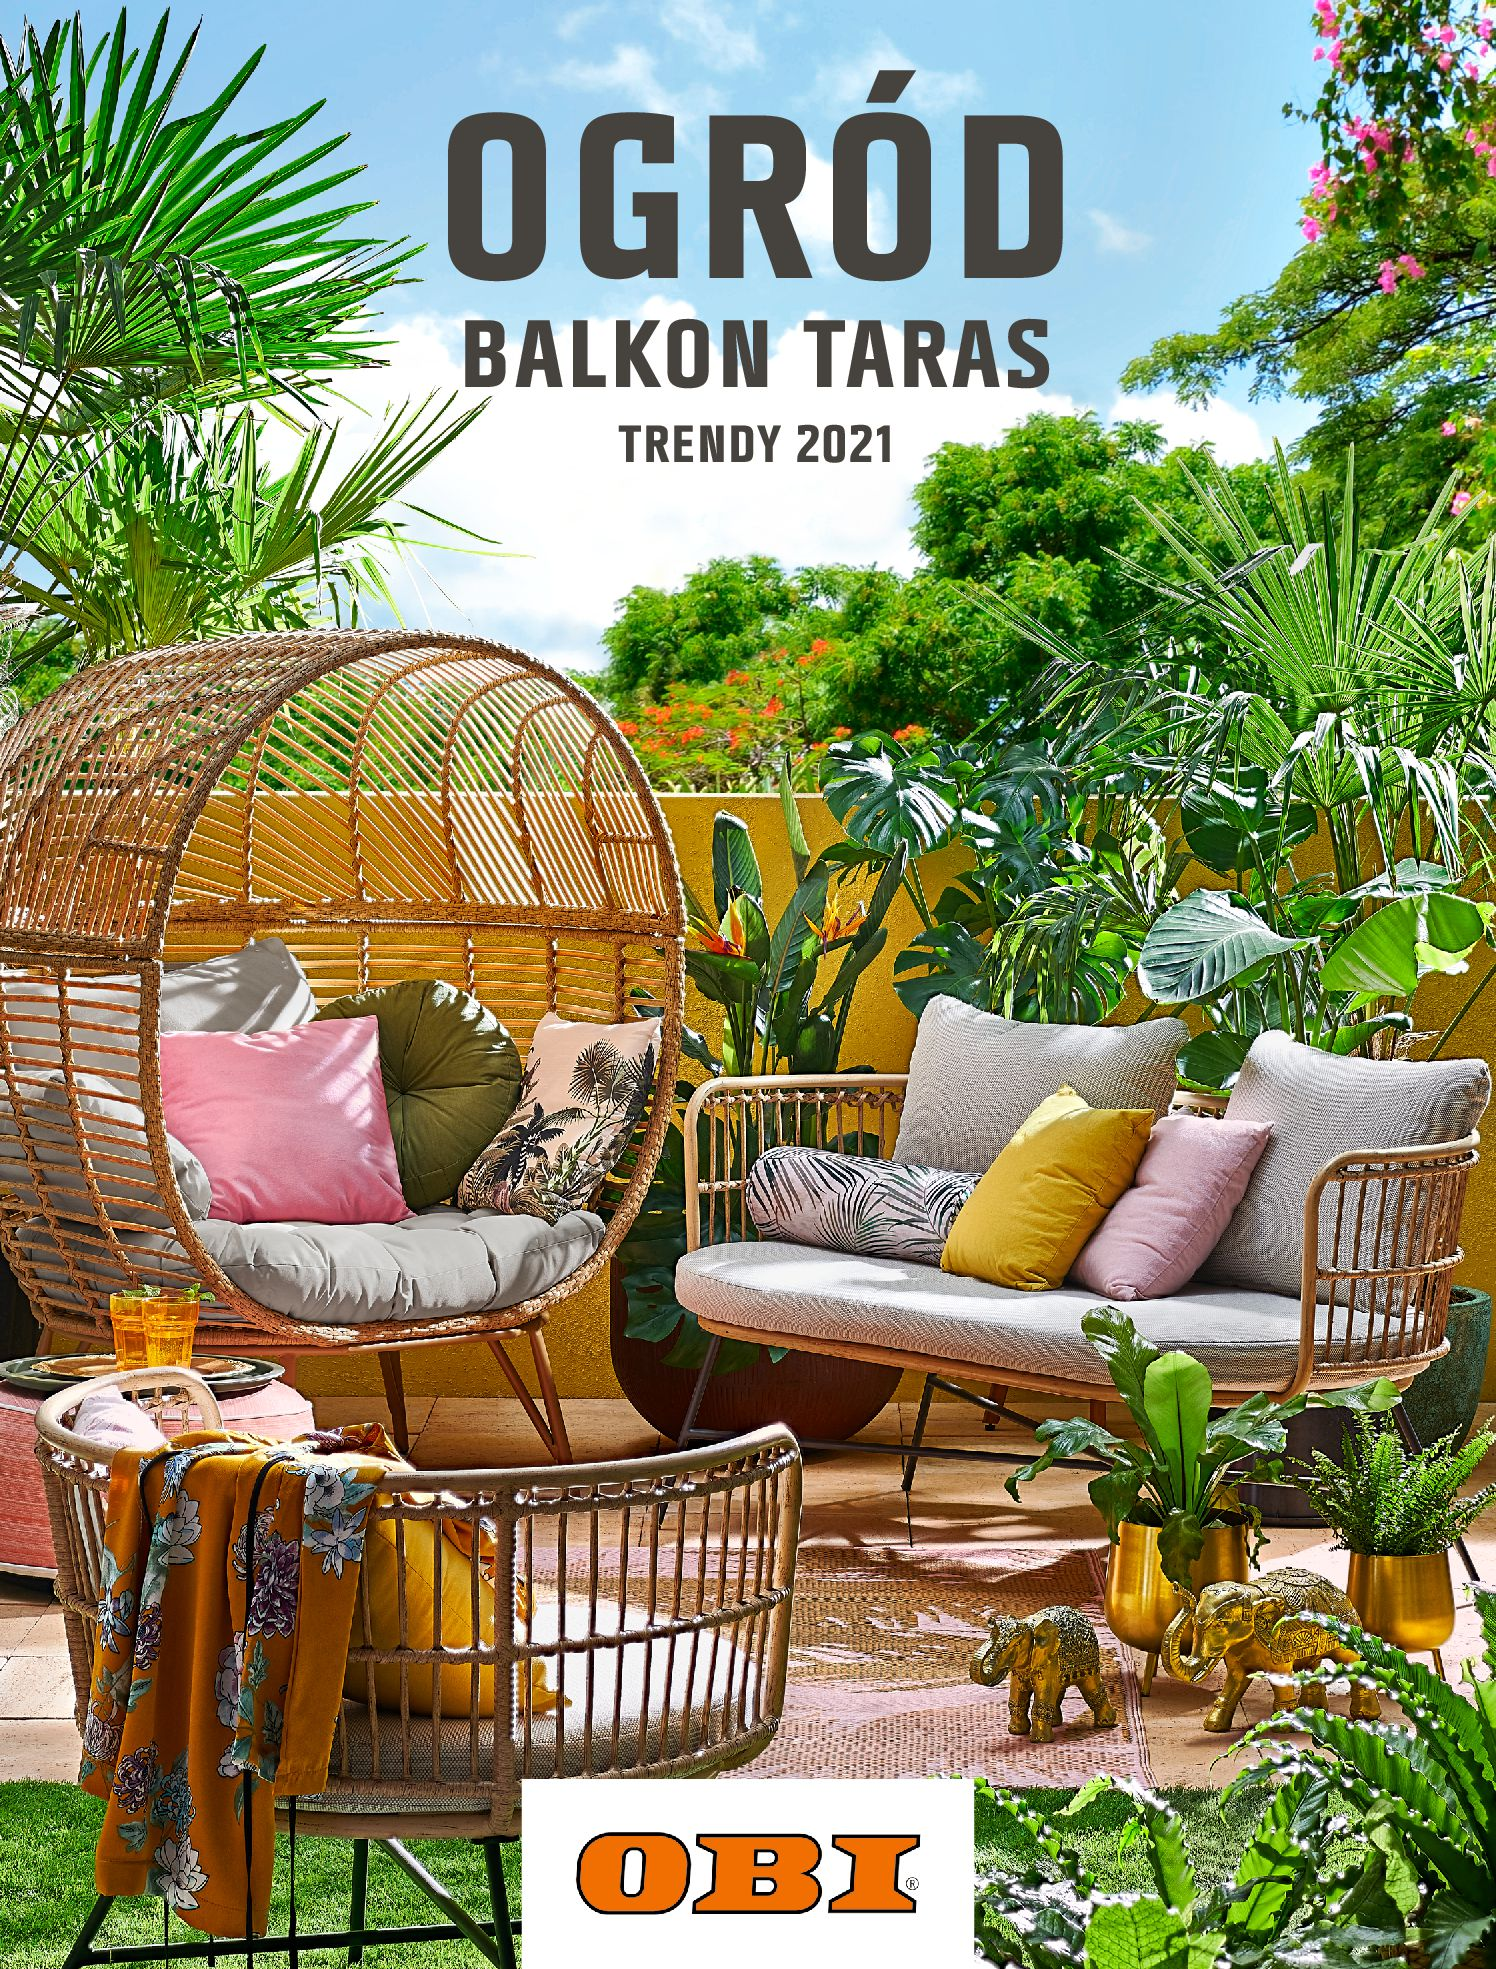 OBI:  Katalog OBI - Ogród, balkon, taras 13.05.2021